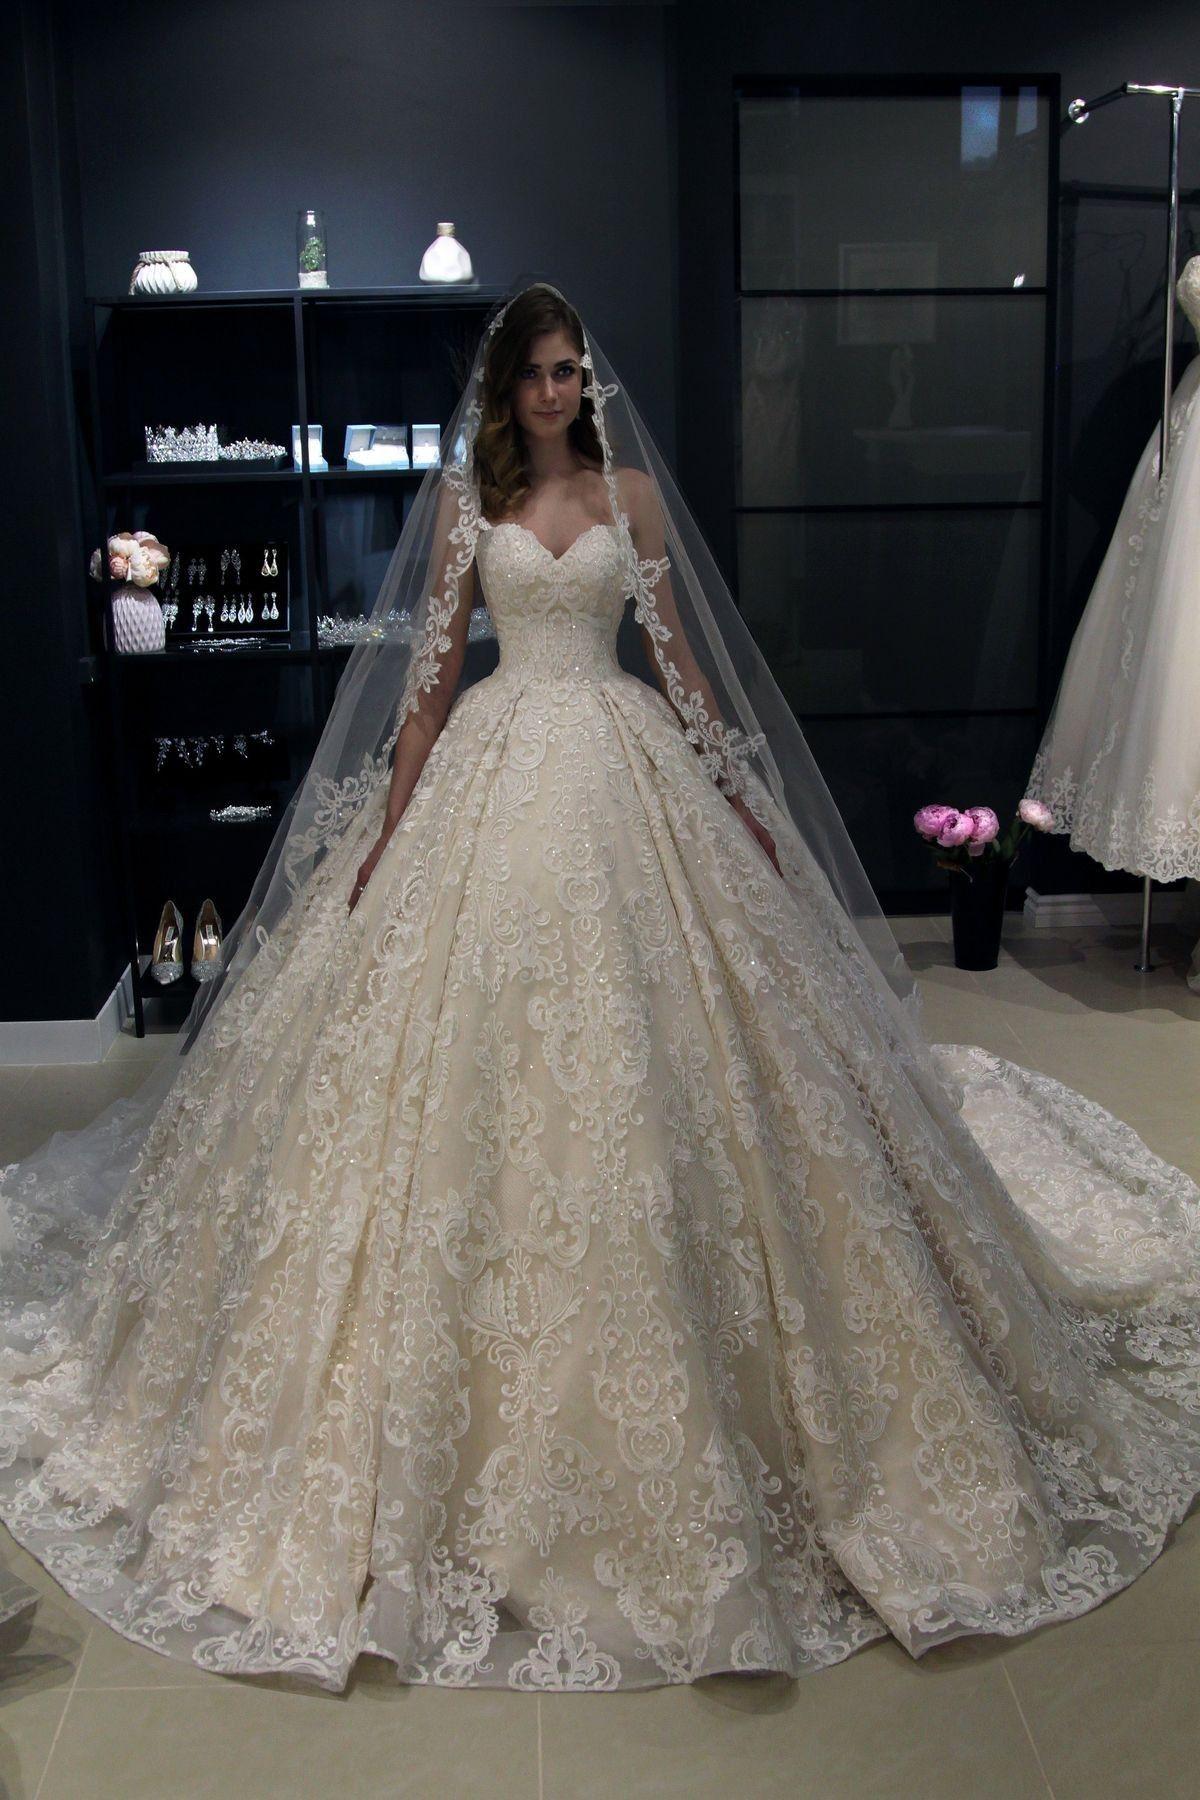 P I N T E R E S T Rachaelgbolaru17 Wedding Dress Bustier Princess Wedding Dresses Ball Gowns Wedding